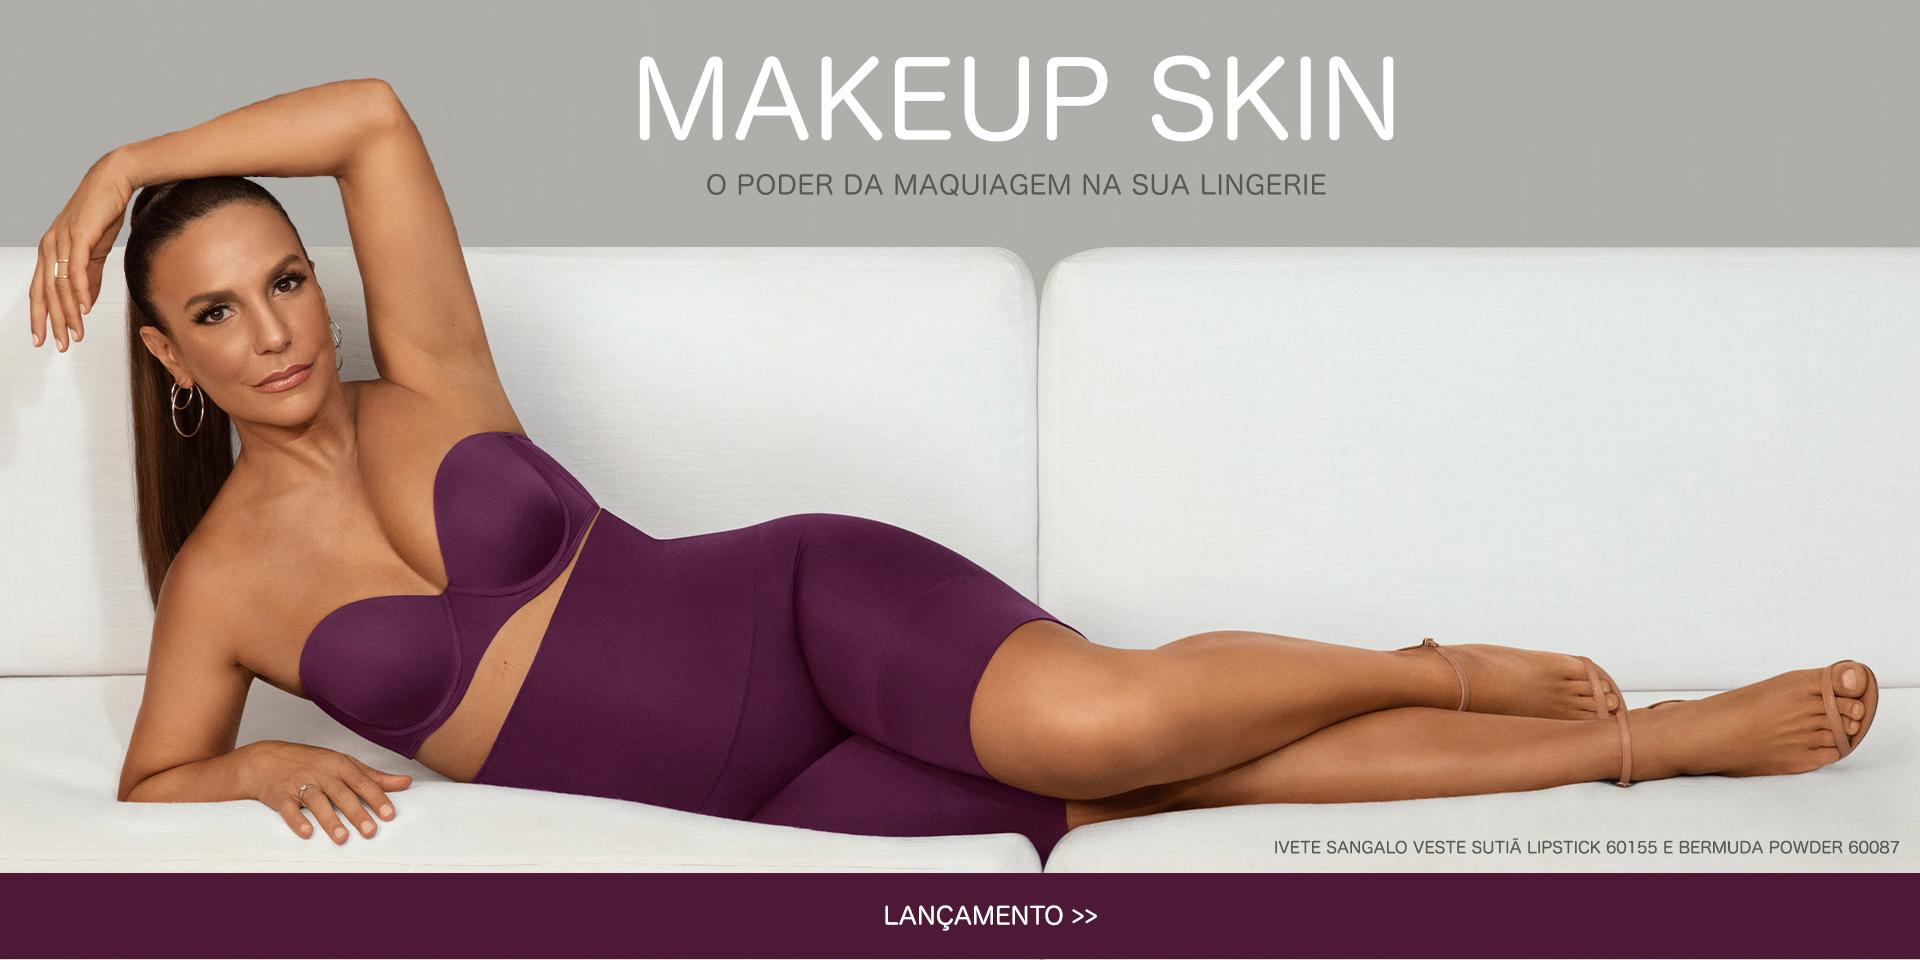 Lançamento Makeup Skin